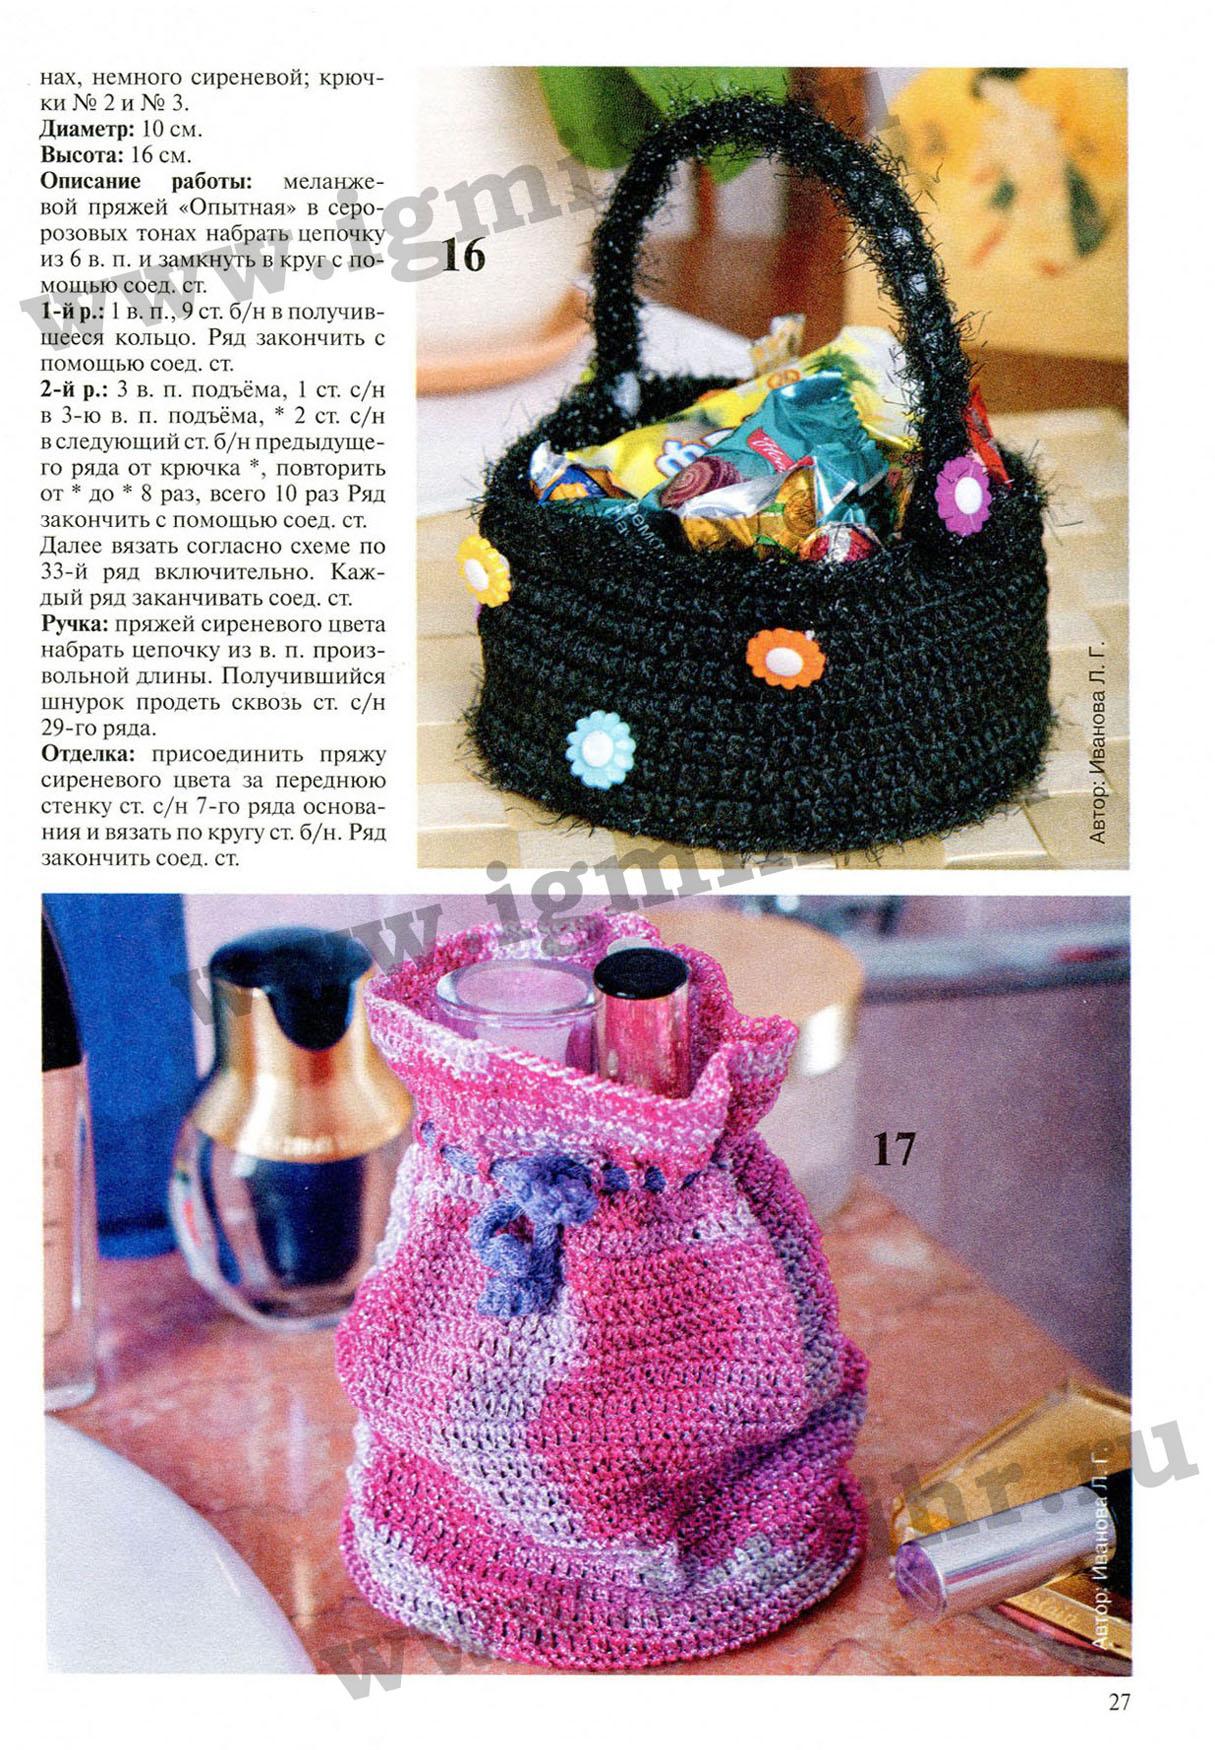 Вязание крючком - Журнал Валентина салфеткиа